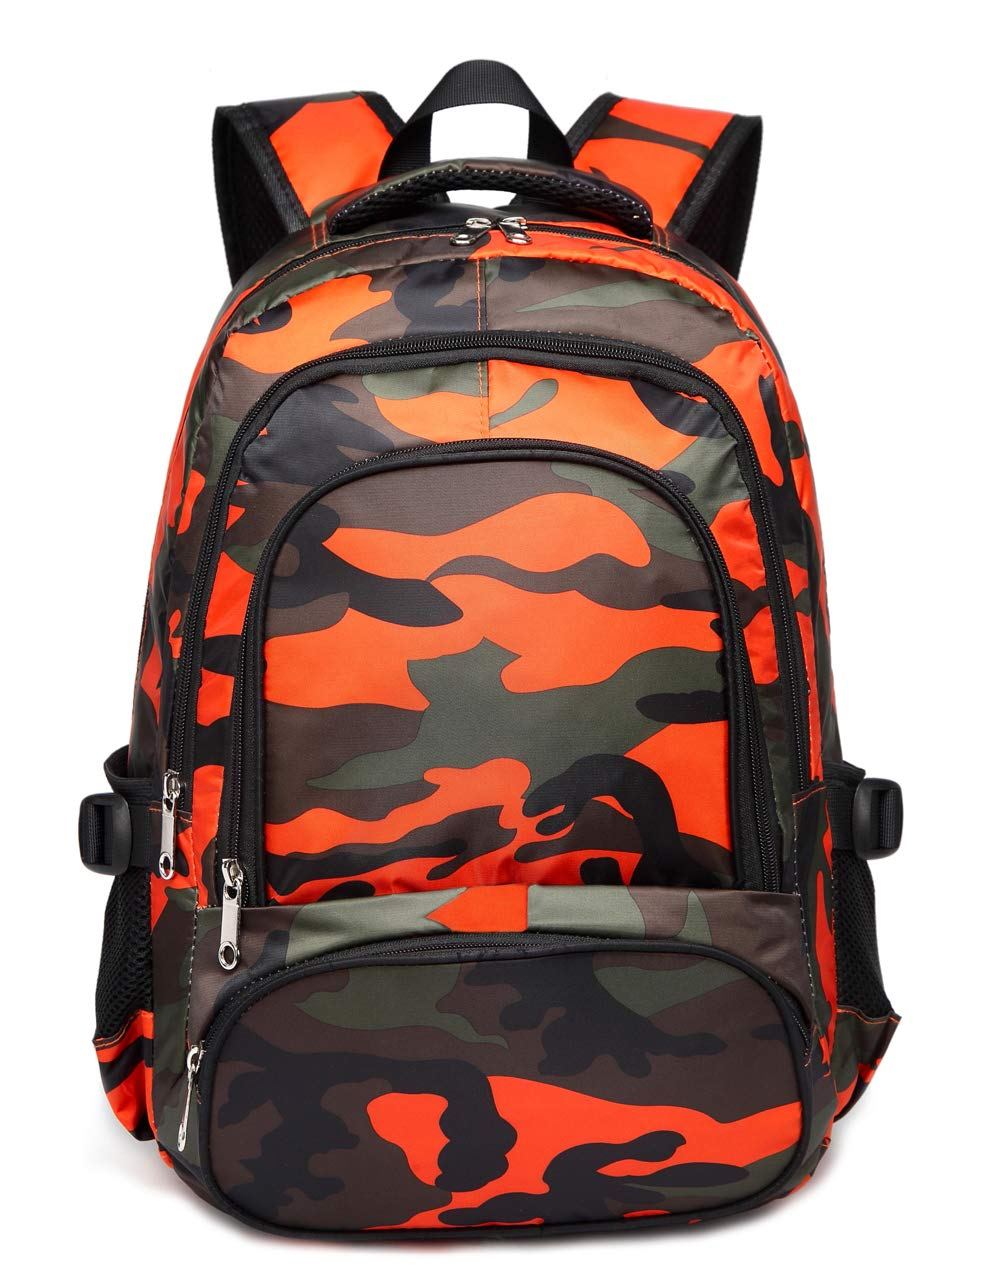 Kids Backpacks for Boys Camouflage Elementary School Bags Bookbags Lightweight Durable (Camo Orange)